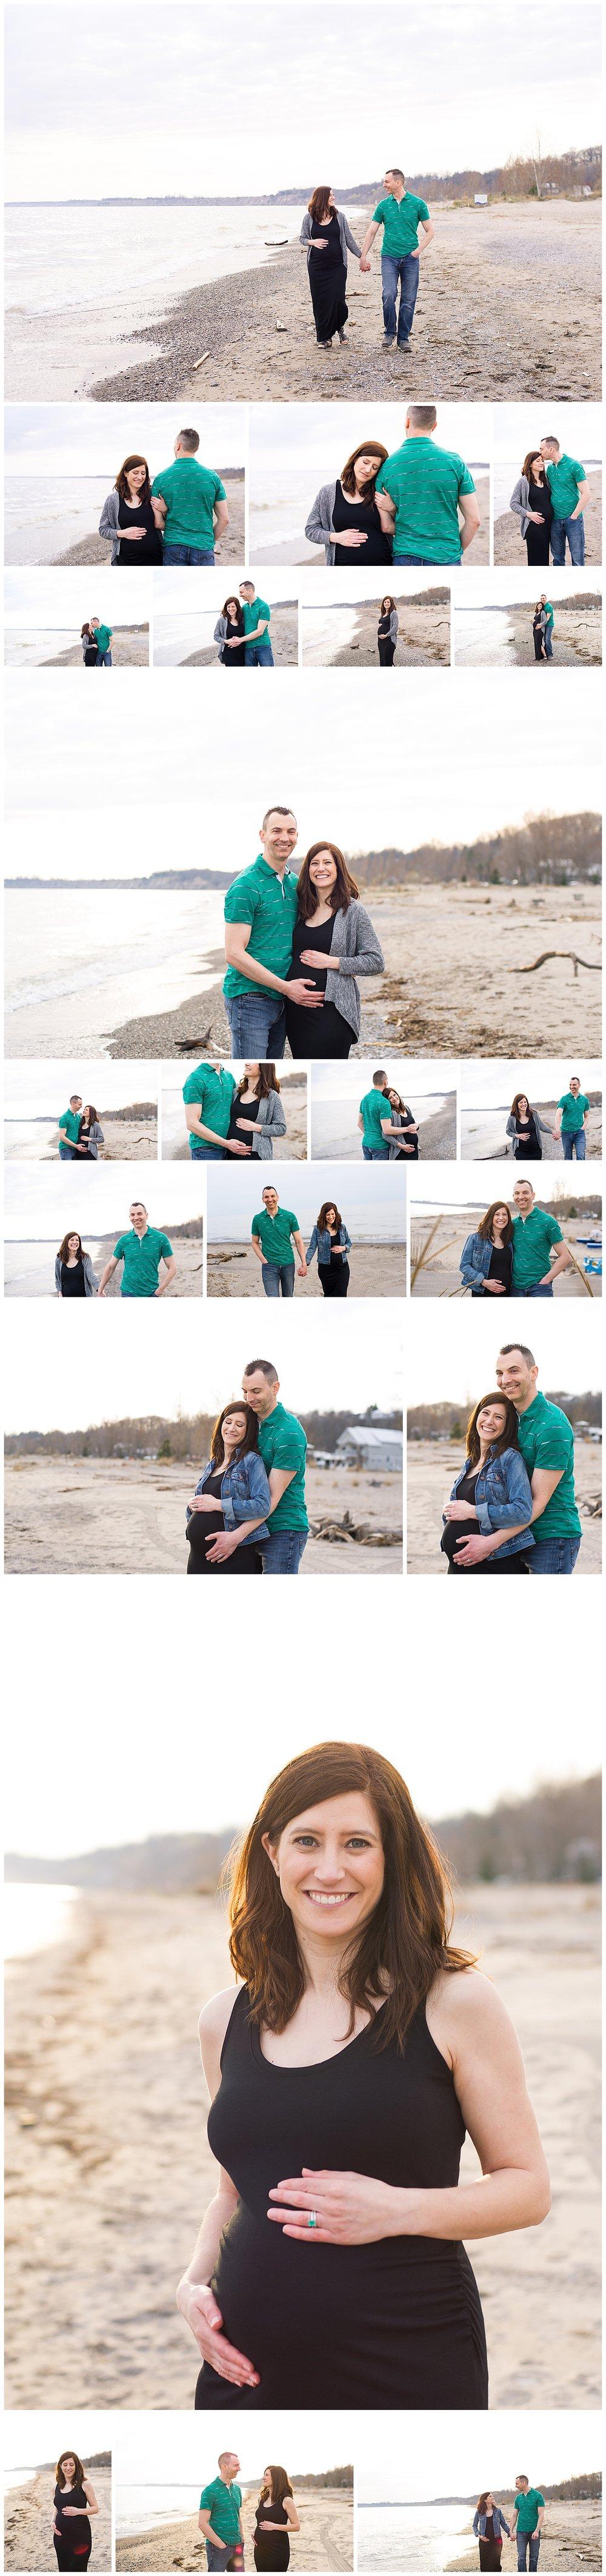 Beach Maternity Photo session - London, Ontario Canada